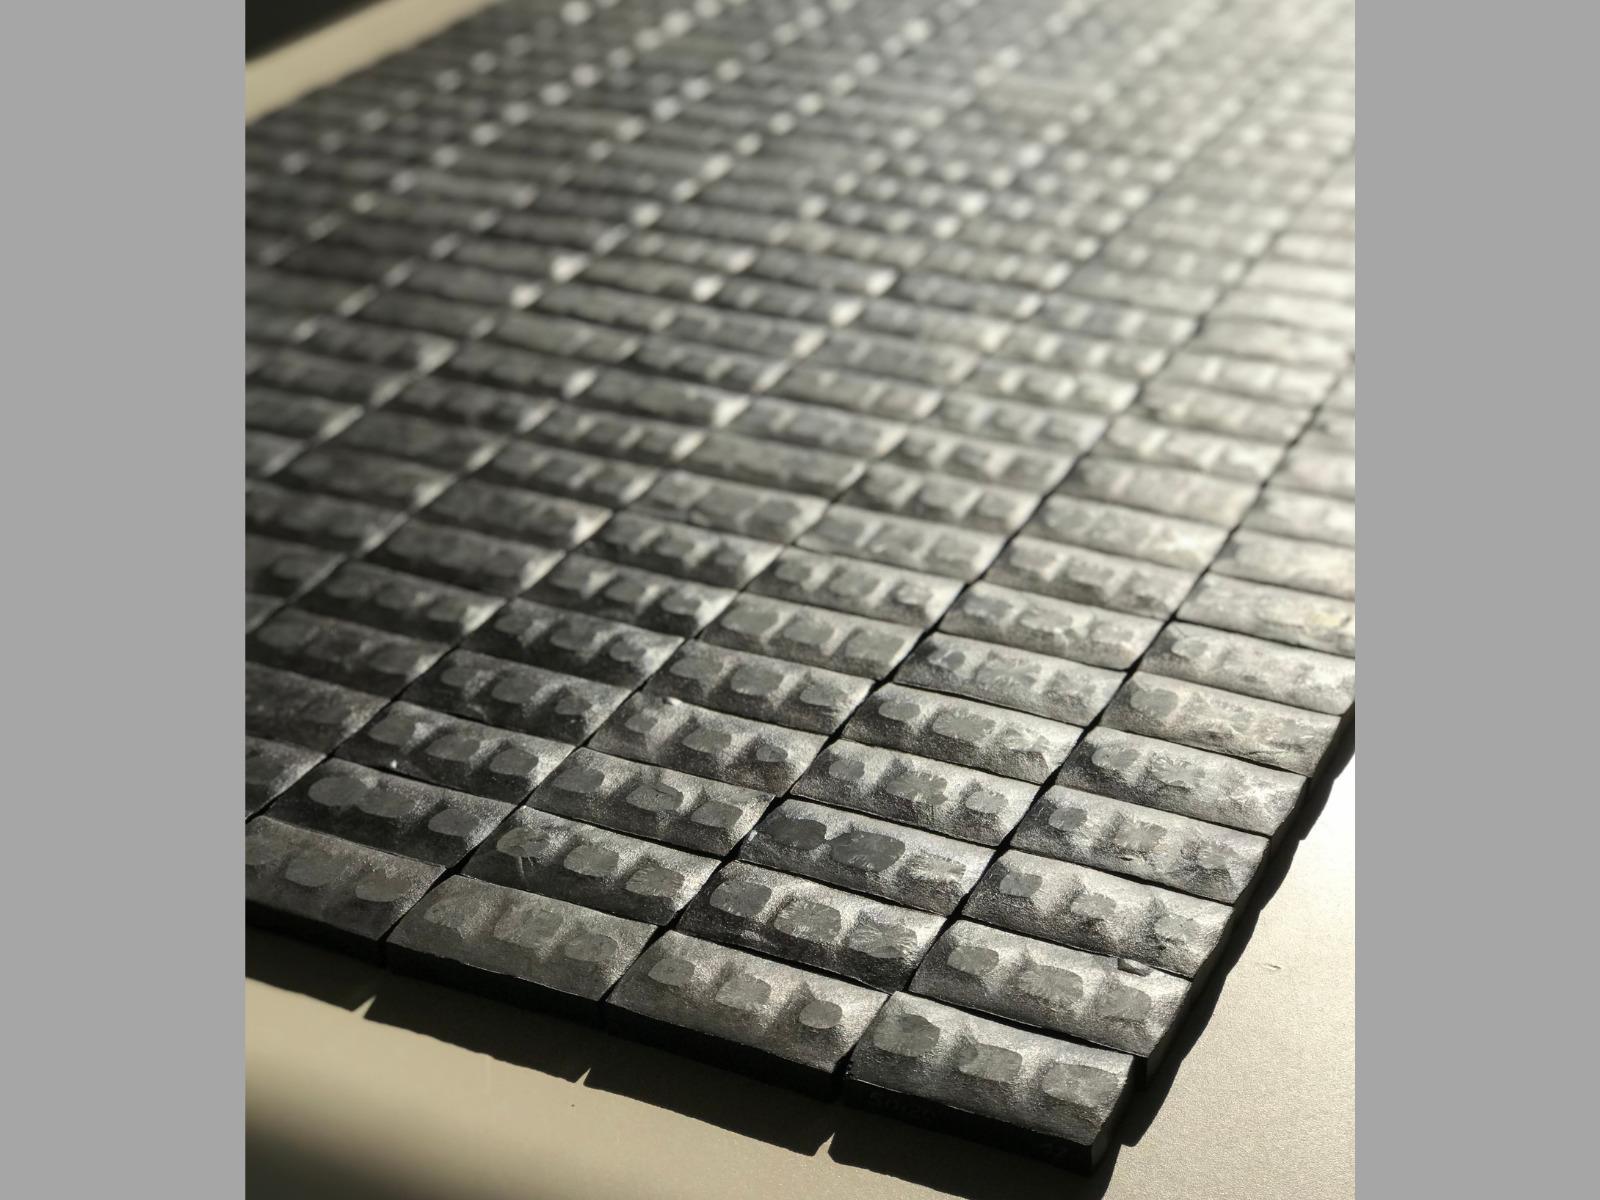 YBCO mass production